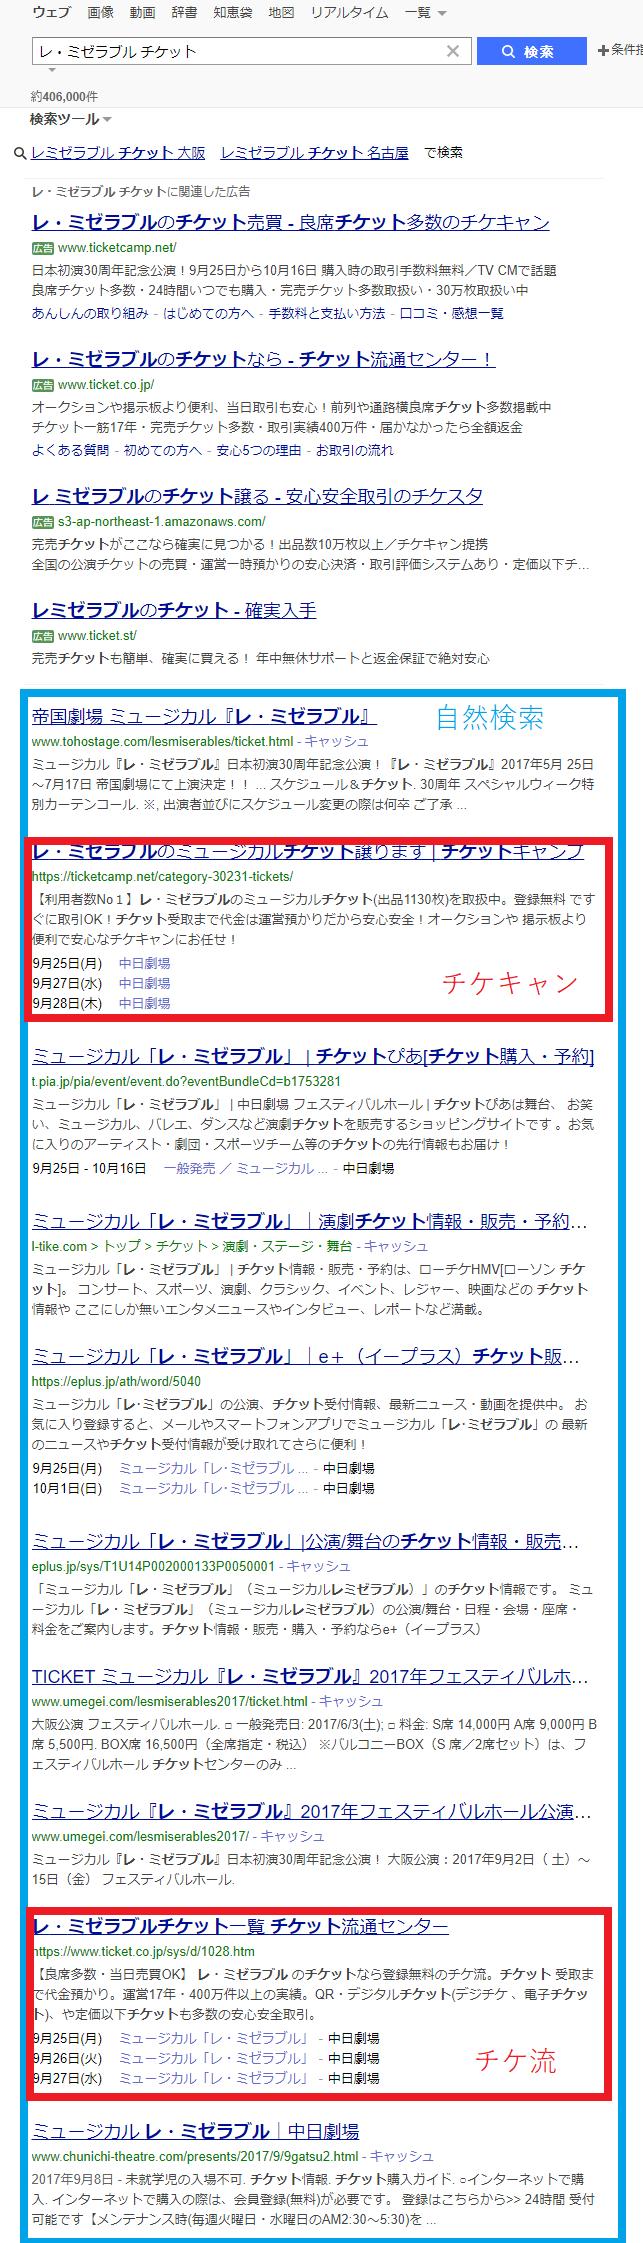 Yahoo!検索「レ・ミゼラブル」チケットの例:自然検索に転売サイト(チケキャン・チケ流)が上位ランクイン。広告スペースは全て悪質転売サイトである